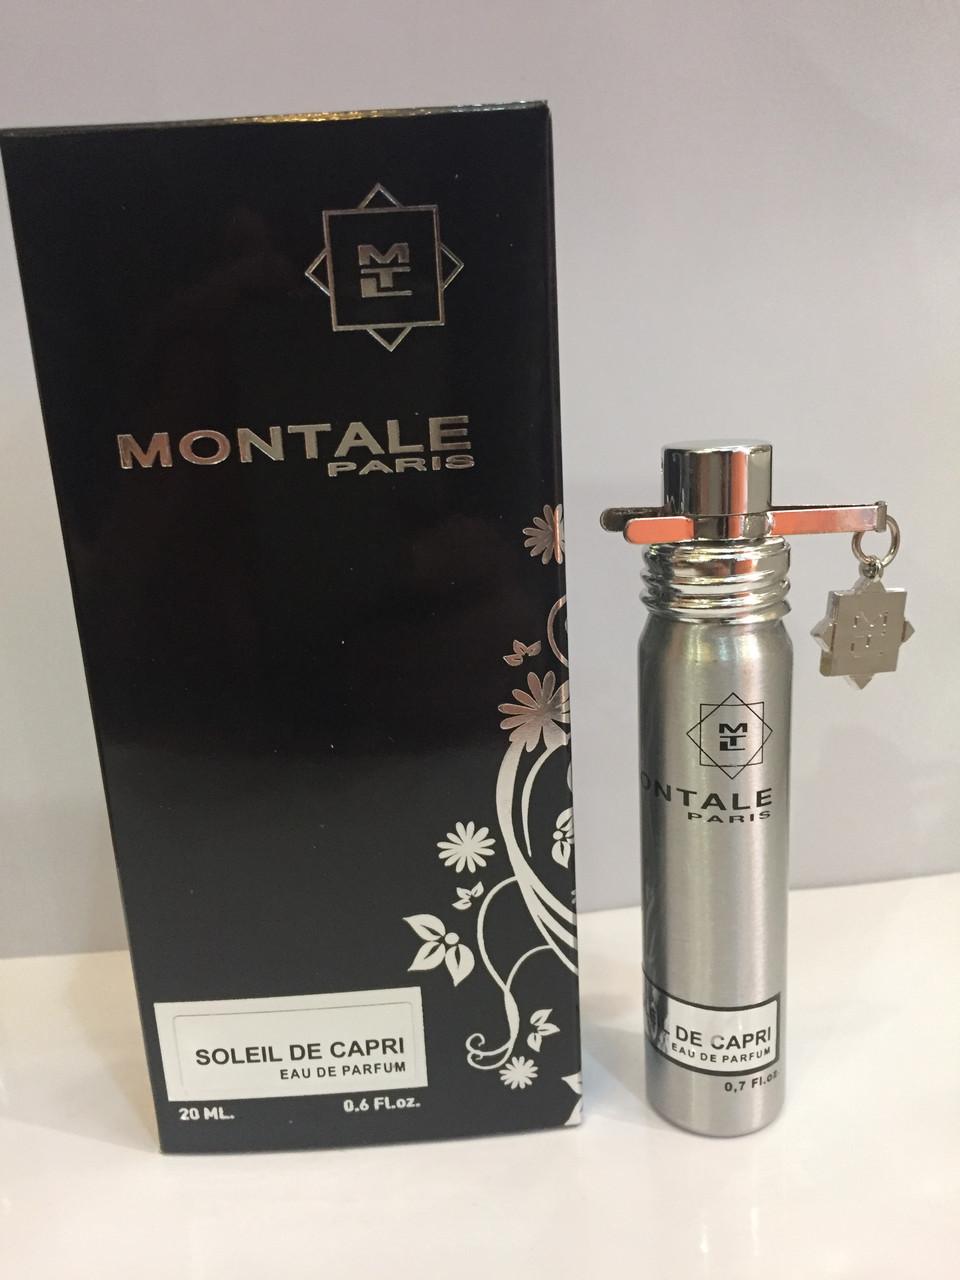 Мини парфюм унисекс Montale Soleil de Capri (Монталь Солей де Капри) 20 мл